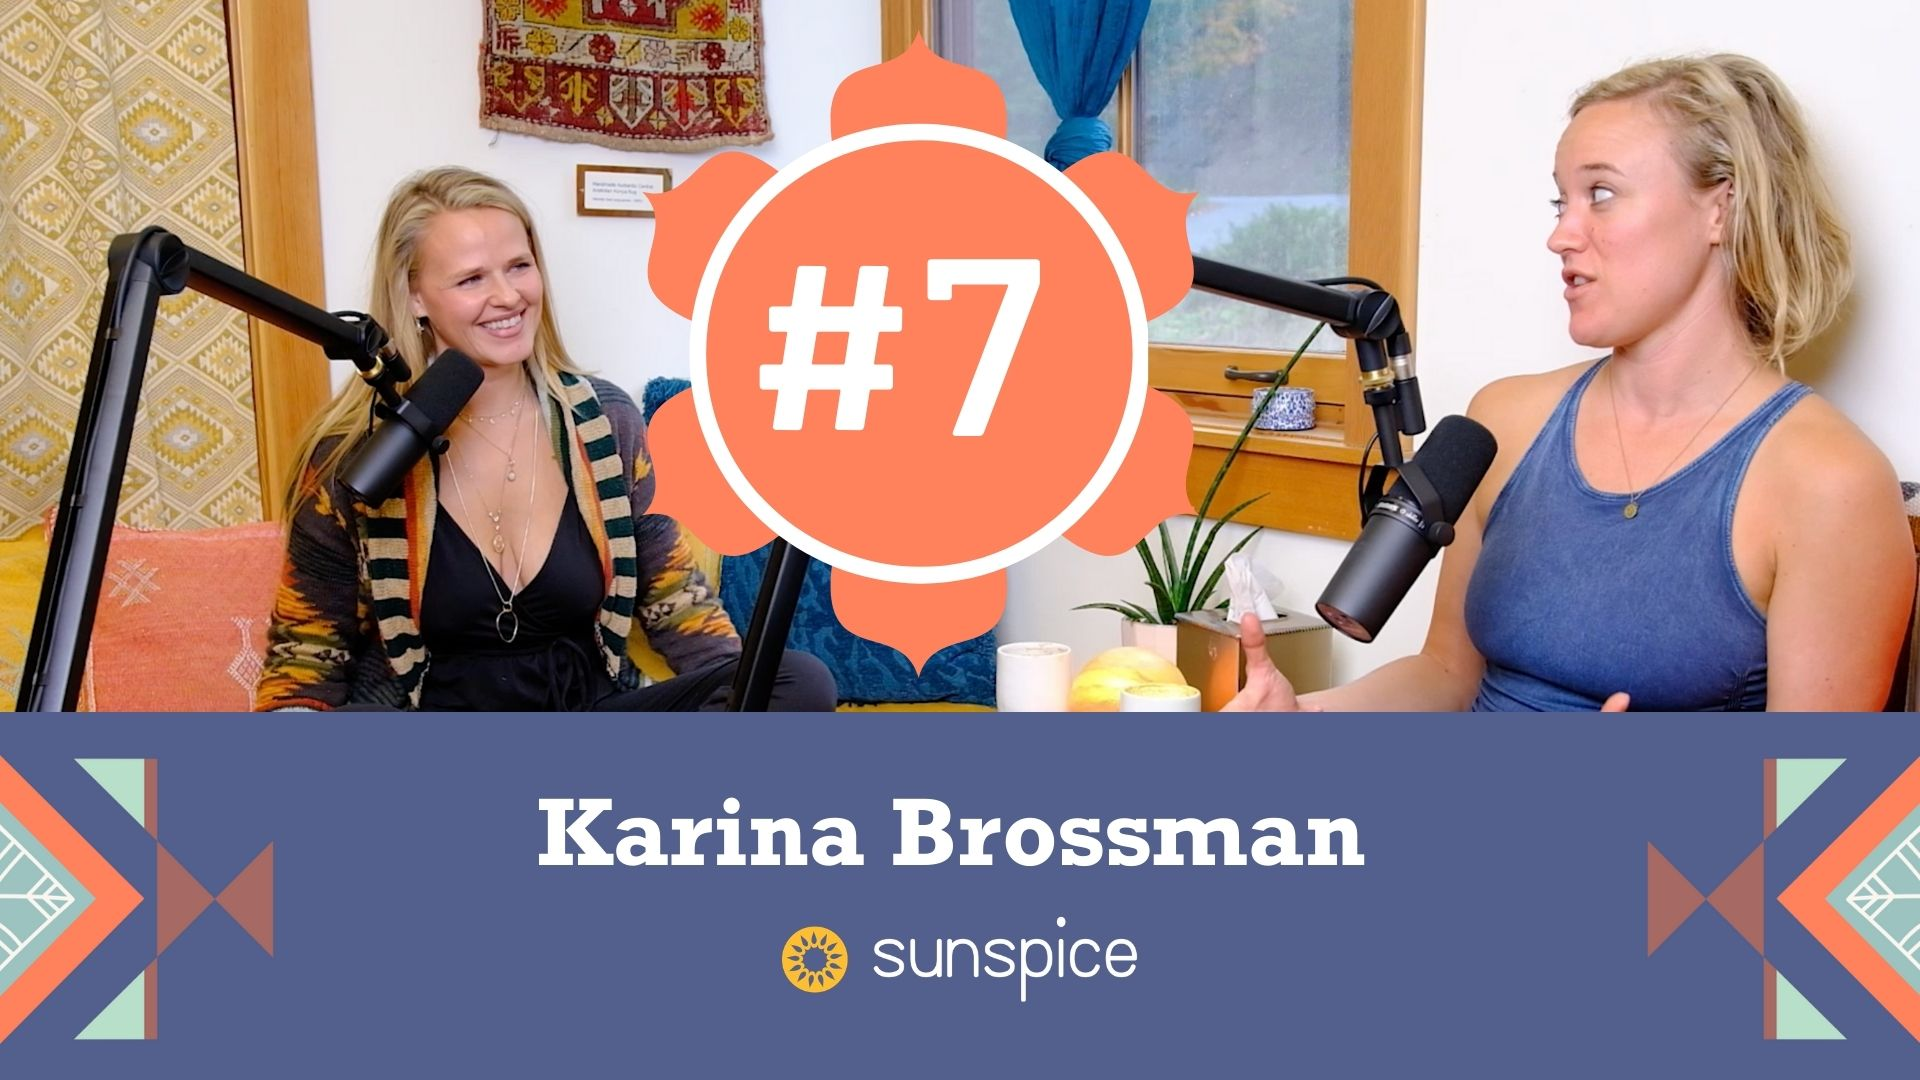 #7 Karina Brossman: The Power of Voice